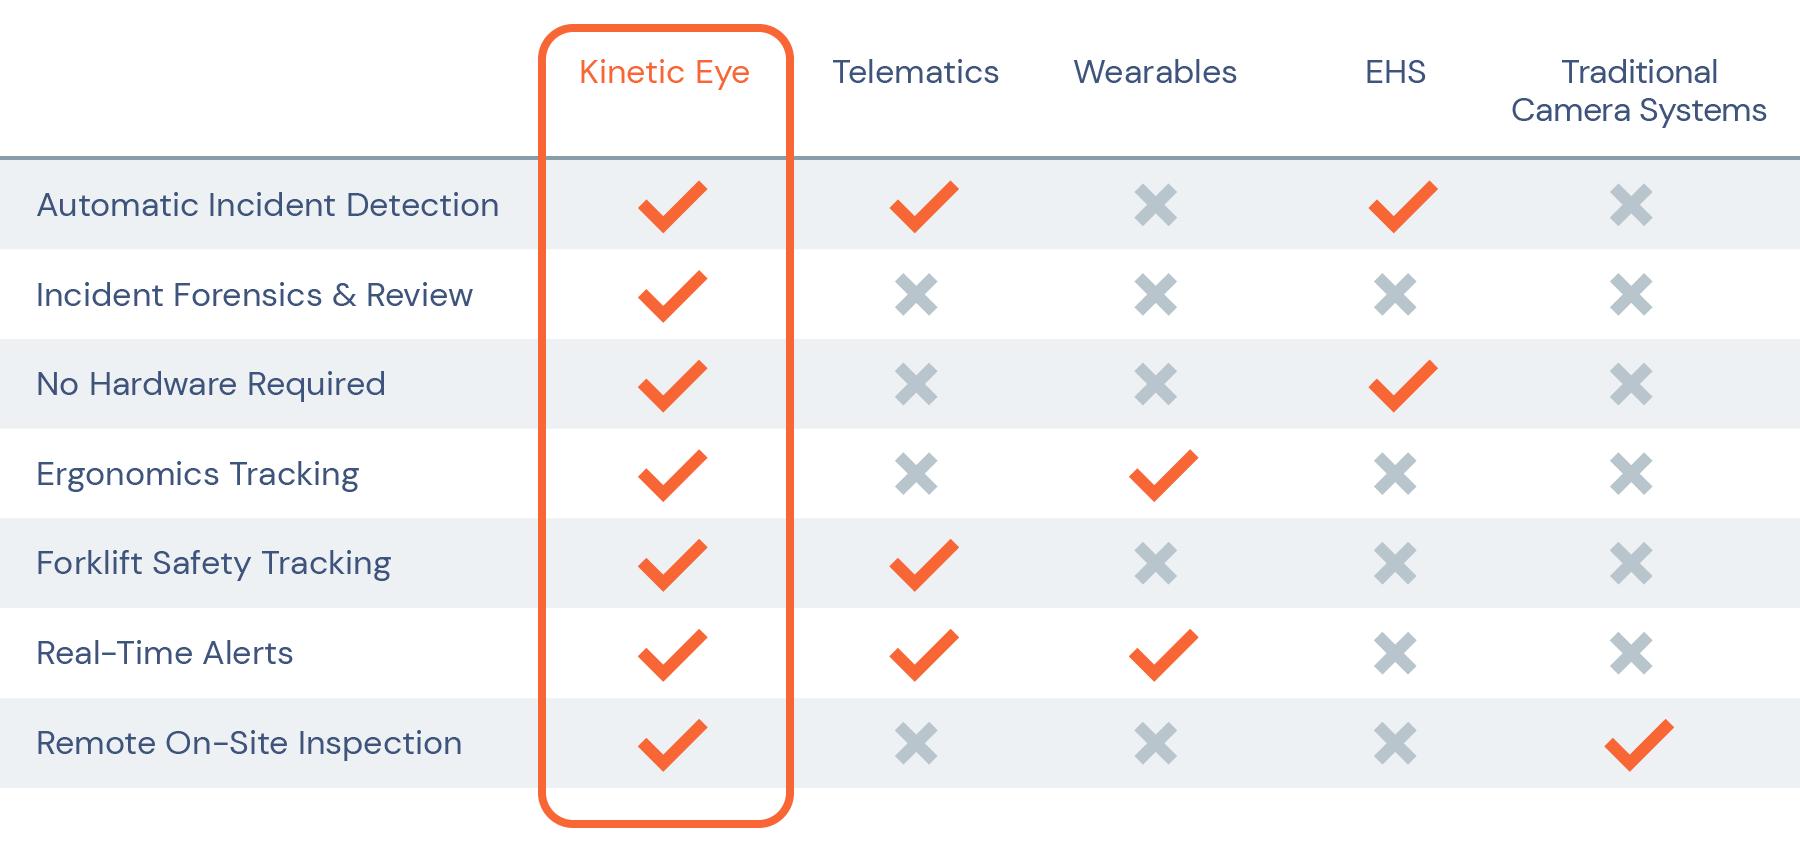 Kinetic Eye Comparison